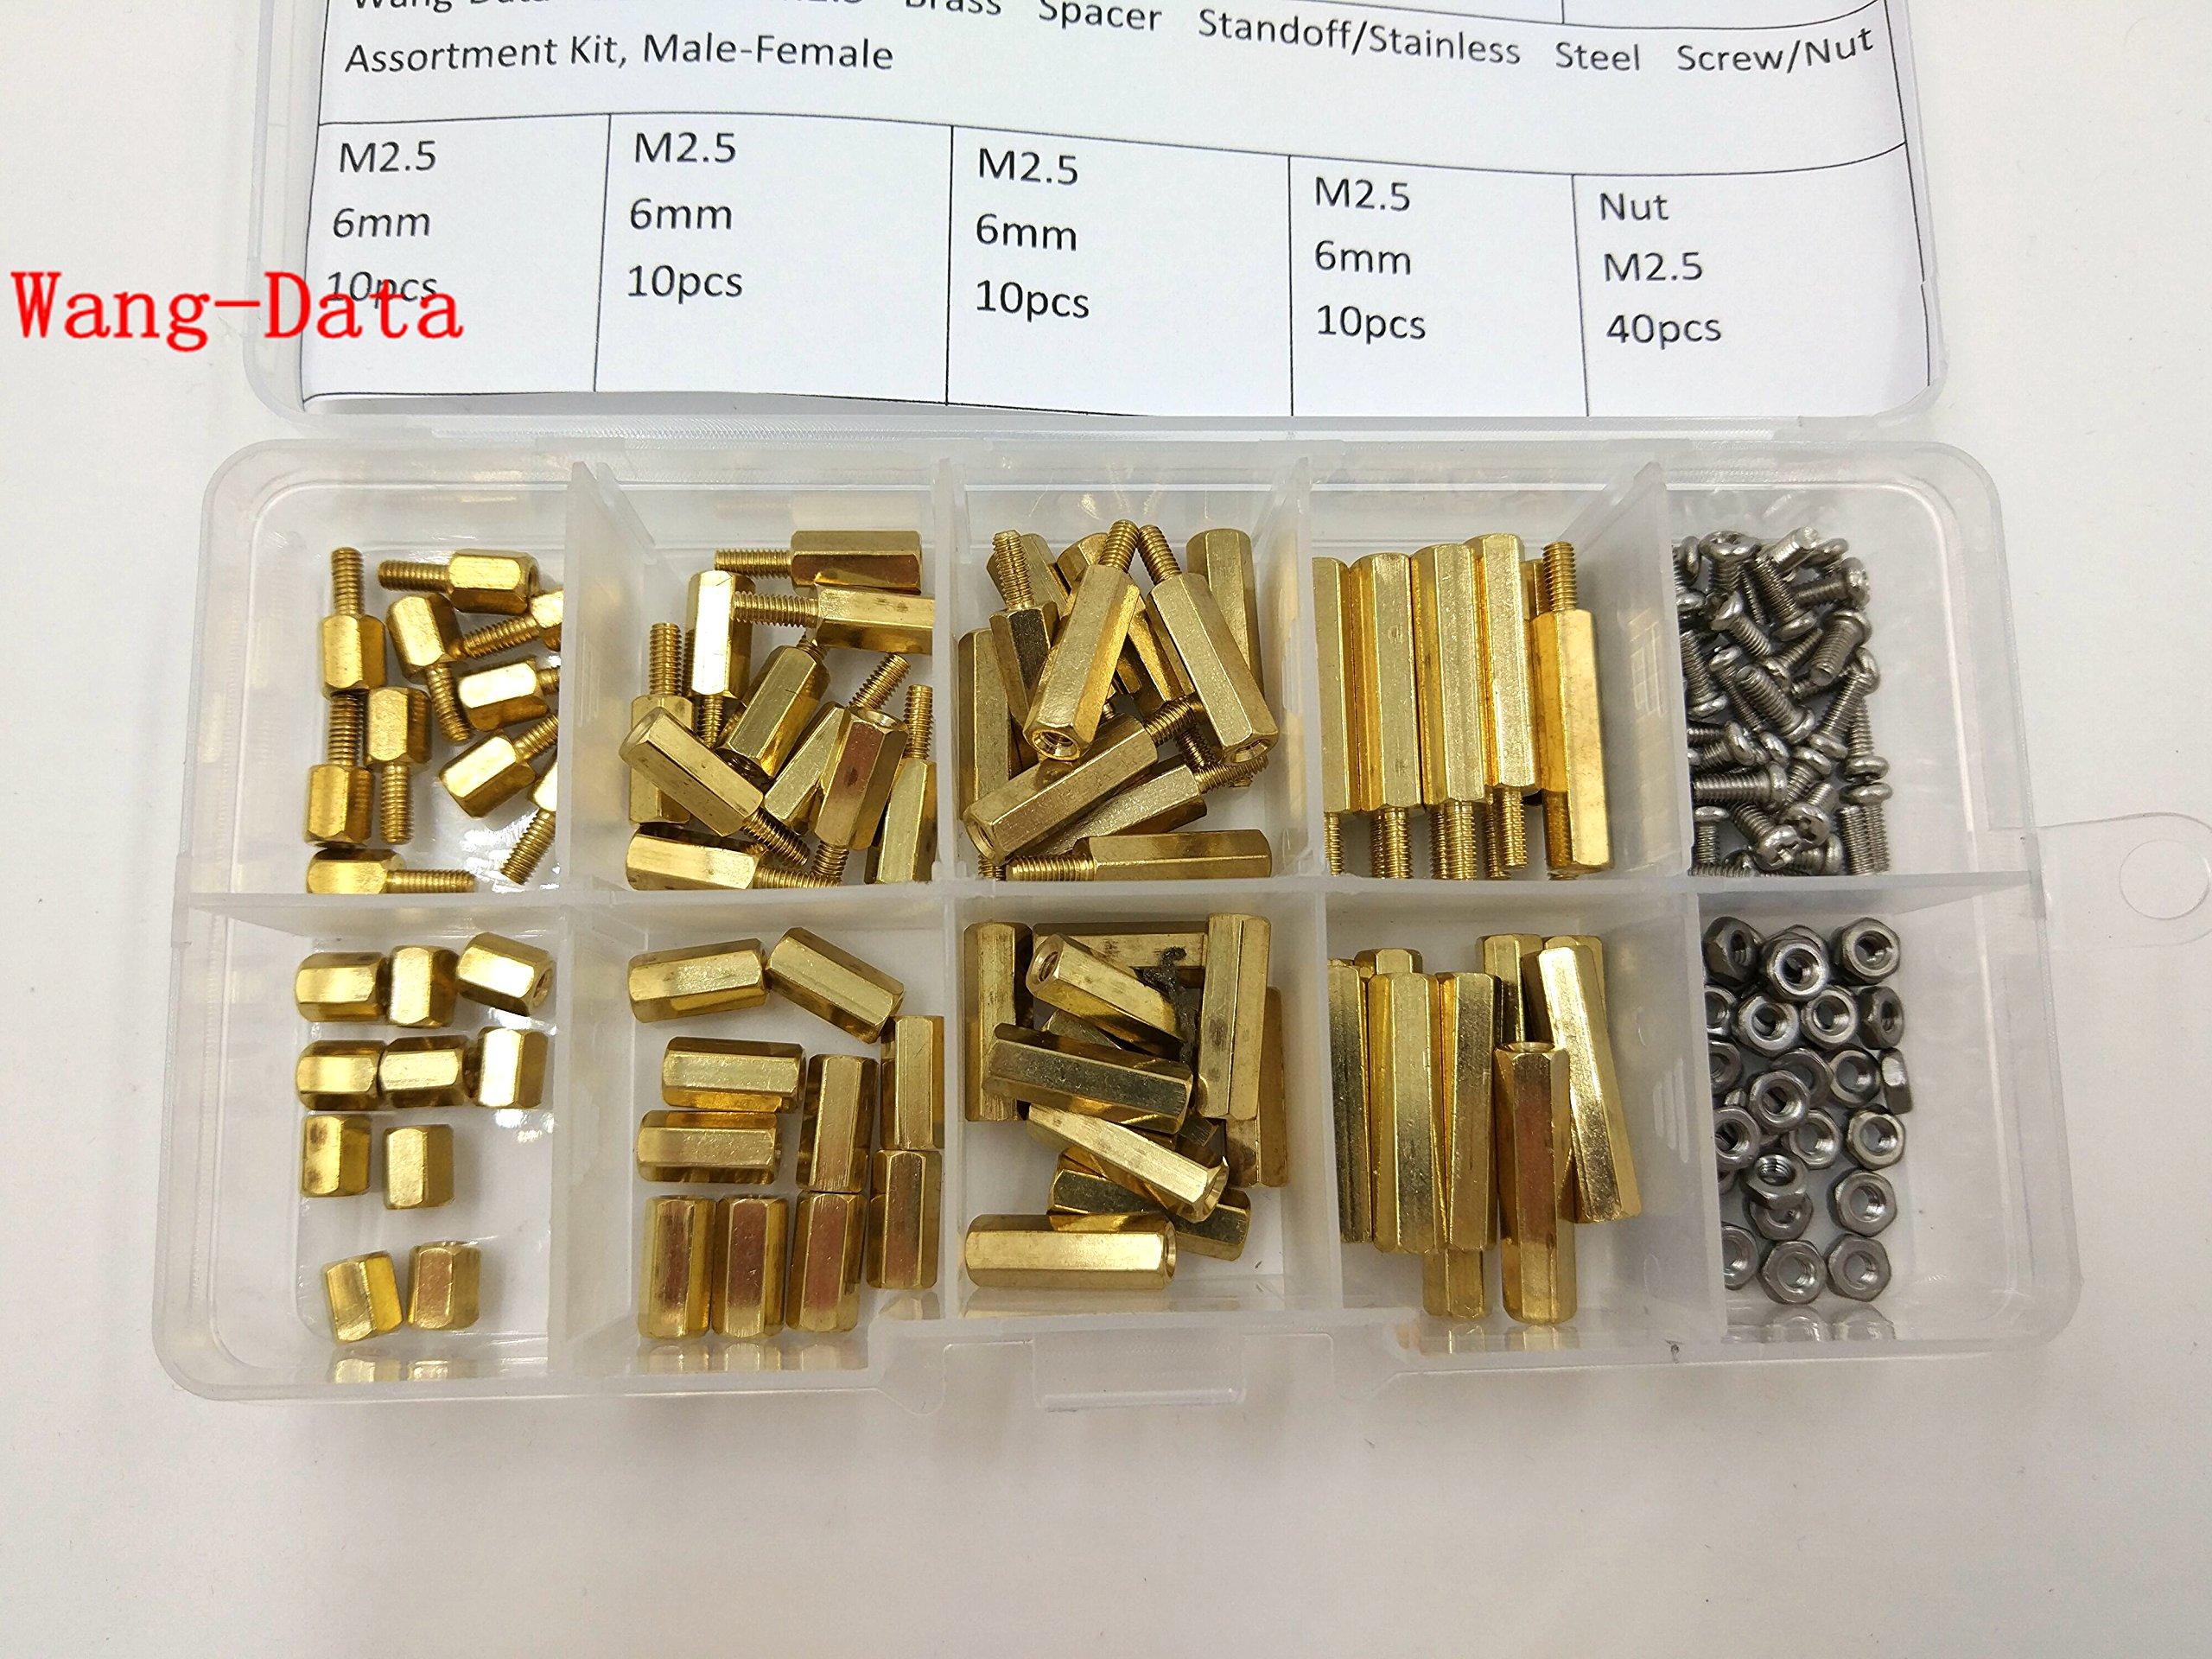 Wang-Data 160PCS M2.5 Brass Spacer Standoff/Stainless Steel Screw/Nut Assortment Kit,Male-Female